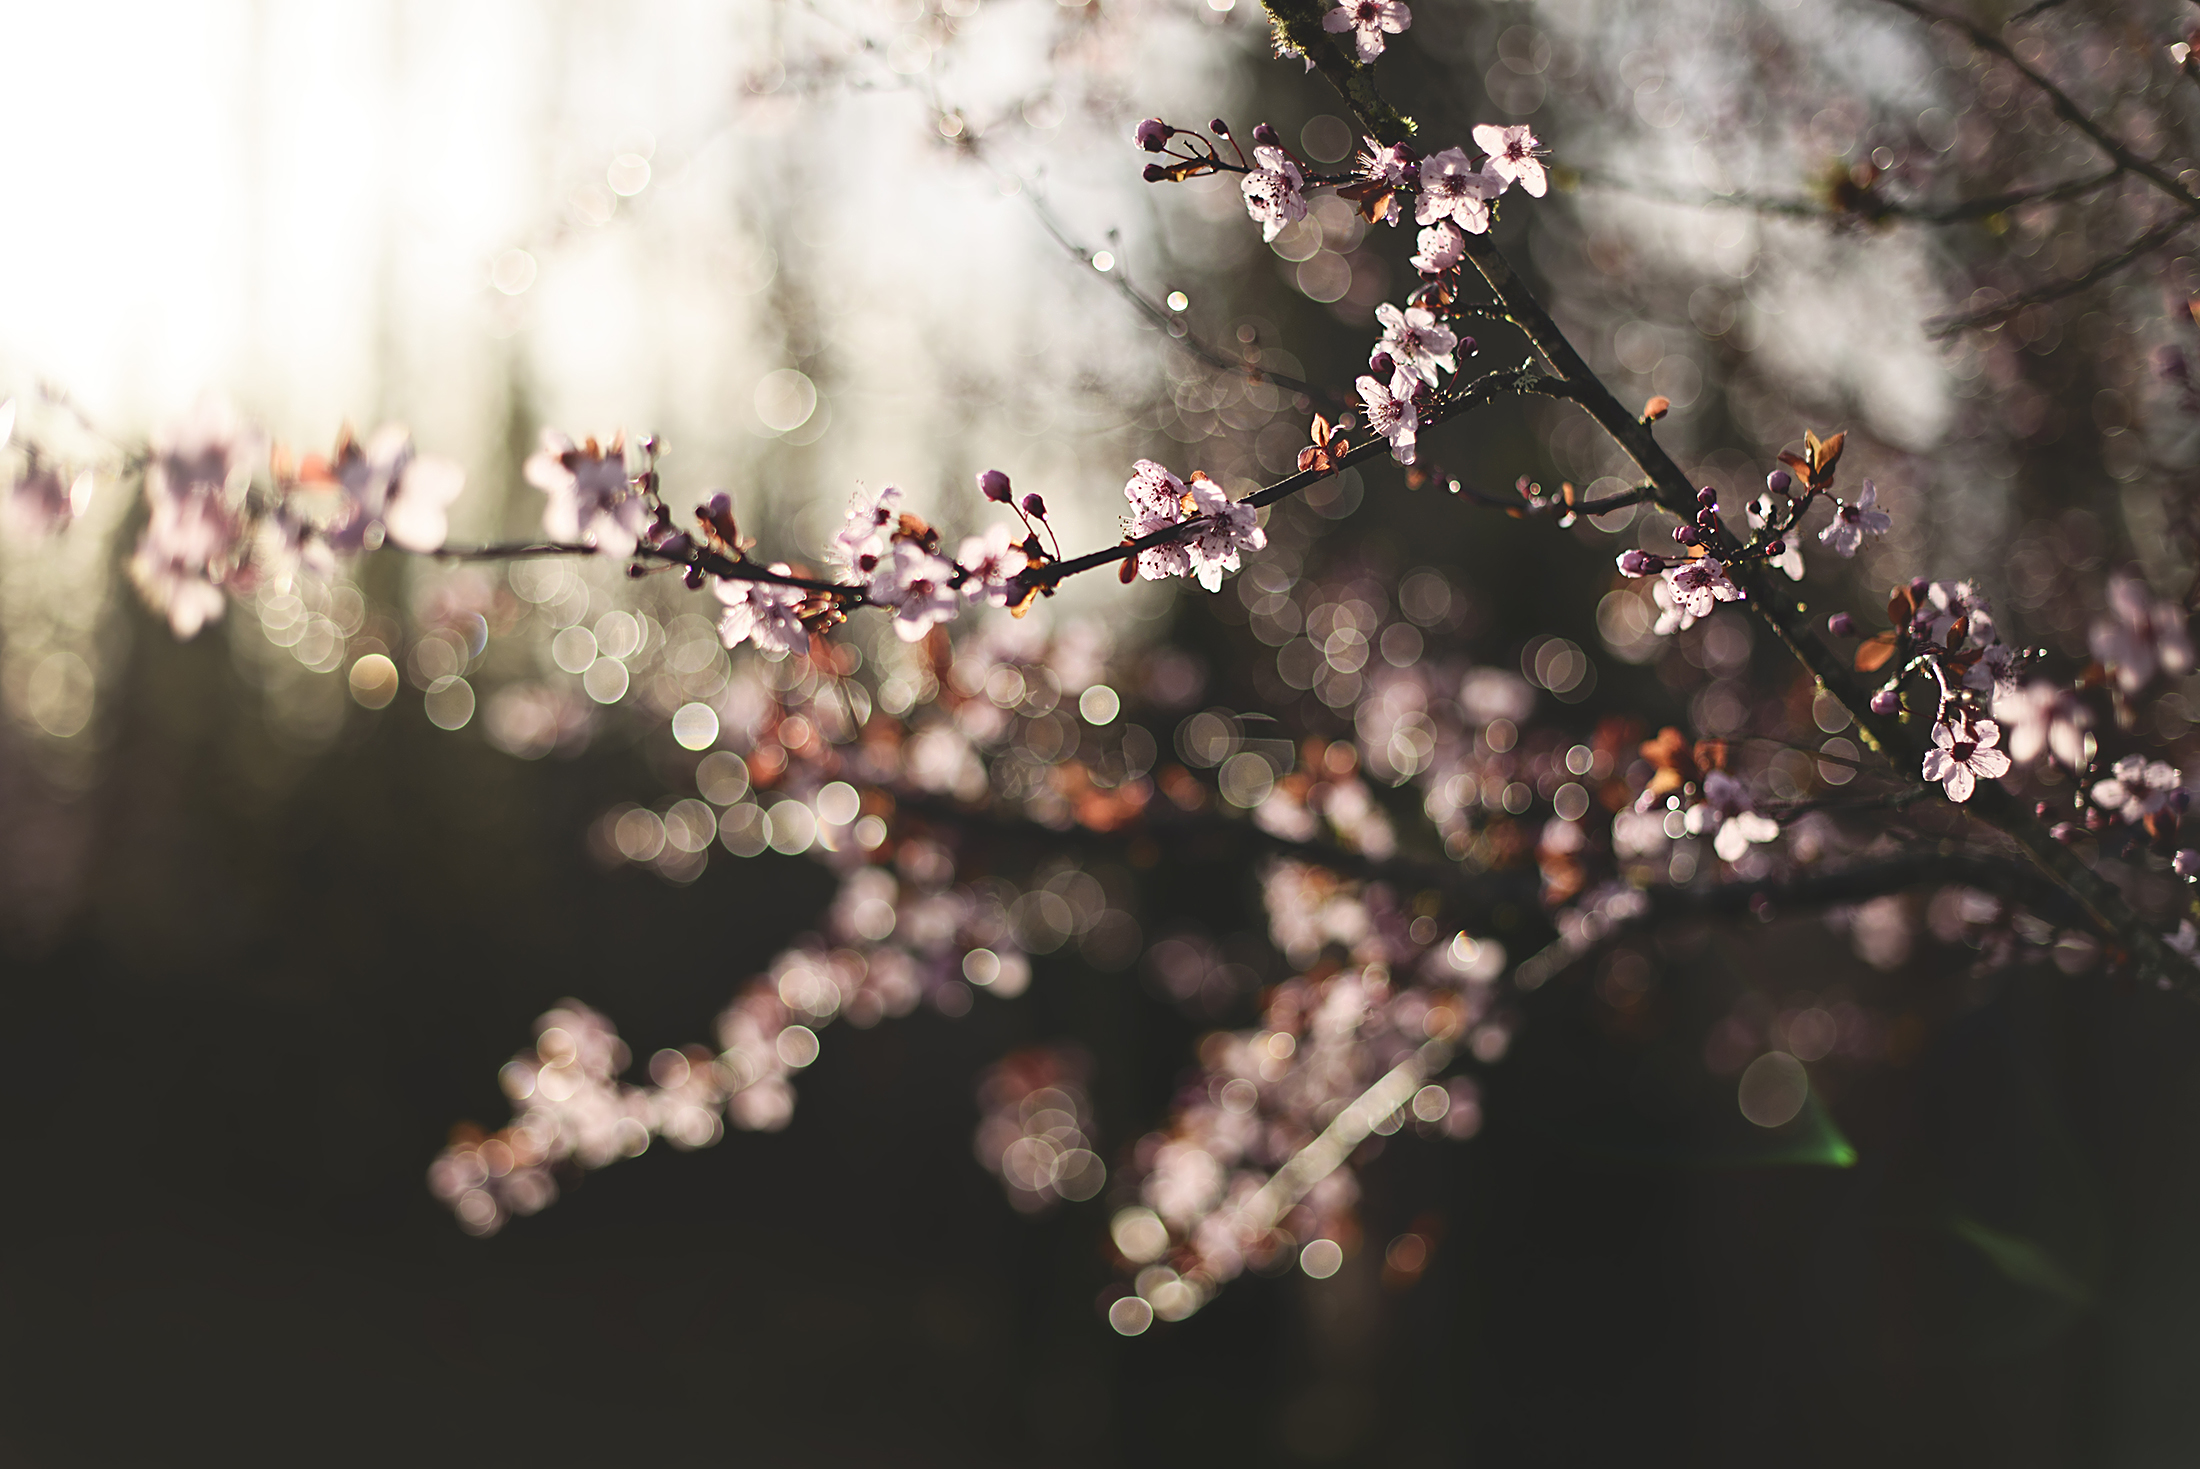 2016-03-03 - Cherry Blossoms 1